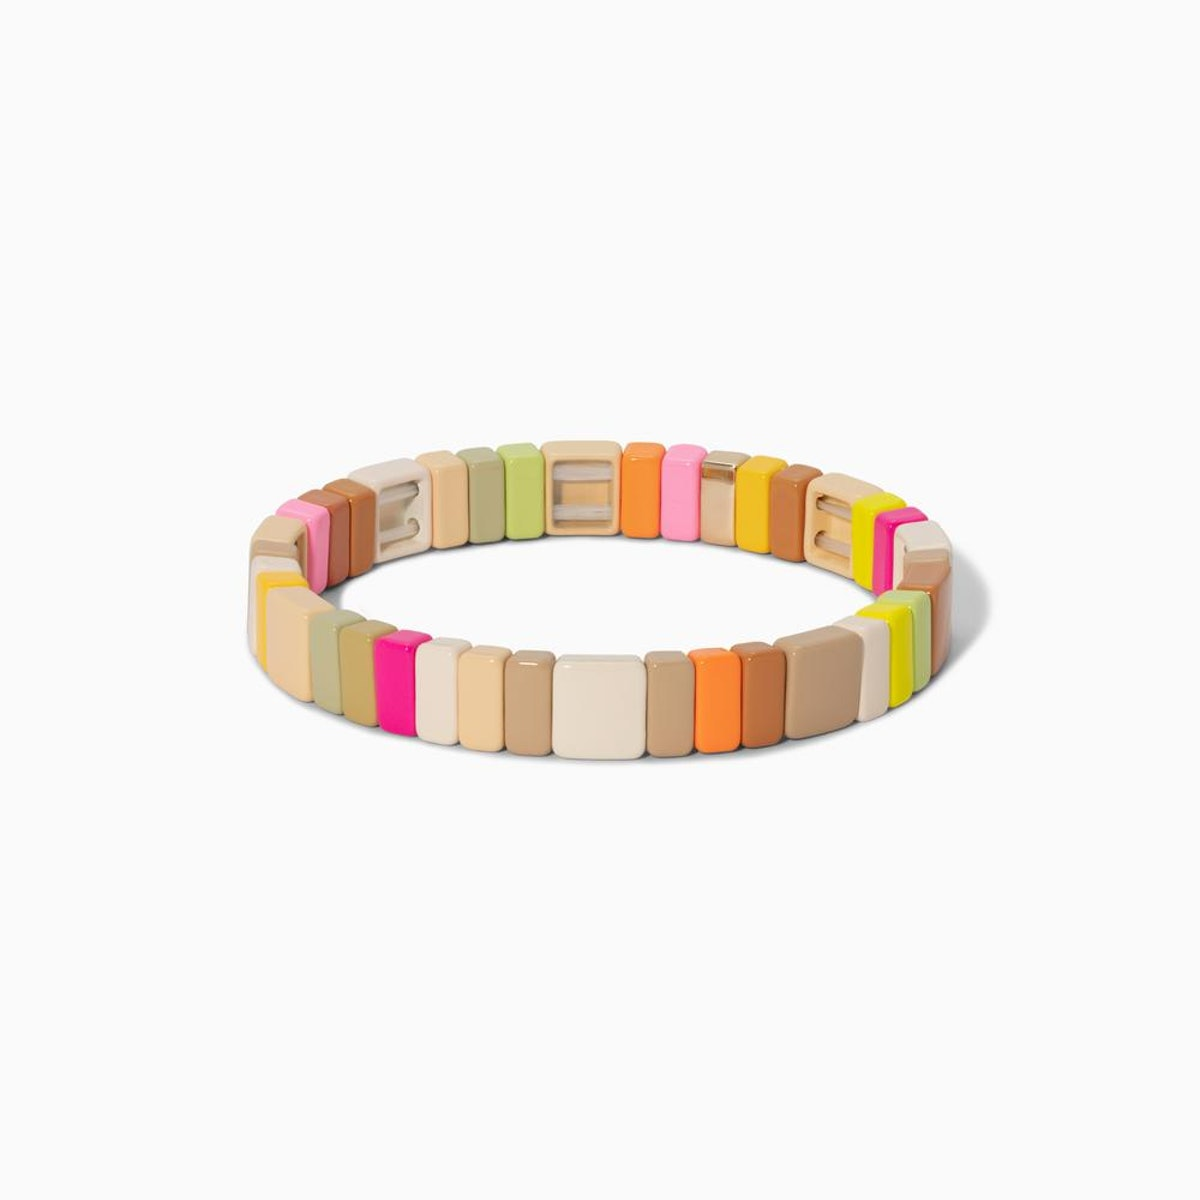 Neons & Neutrals Bracelet